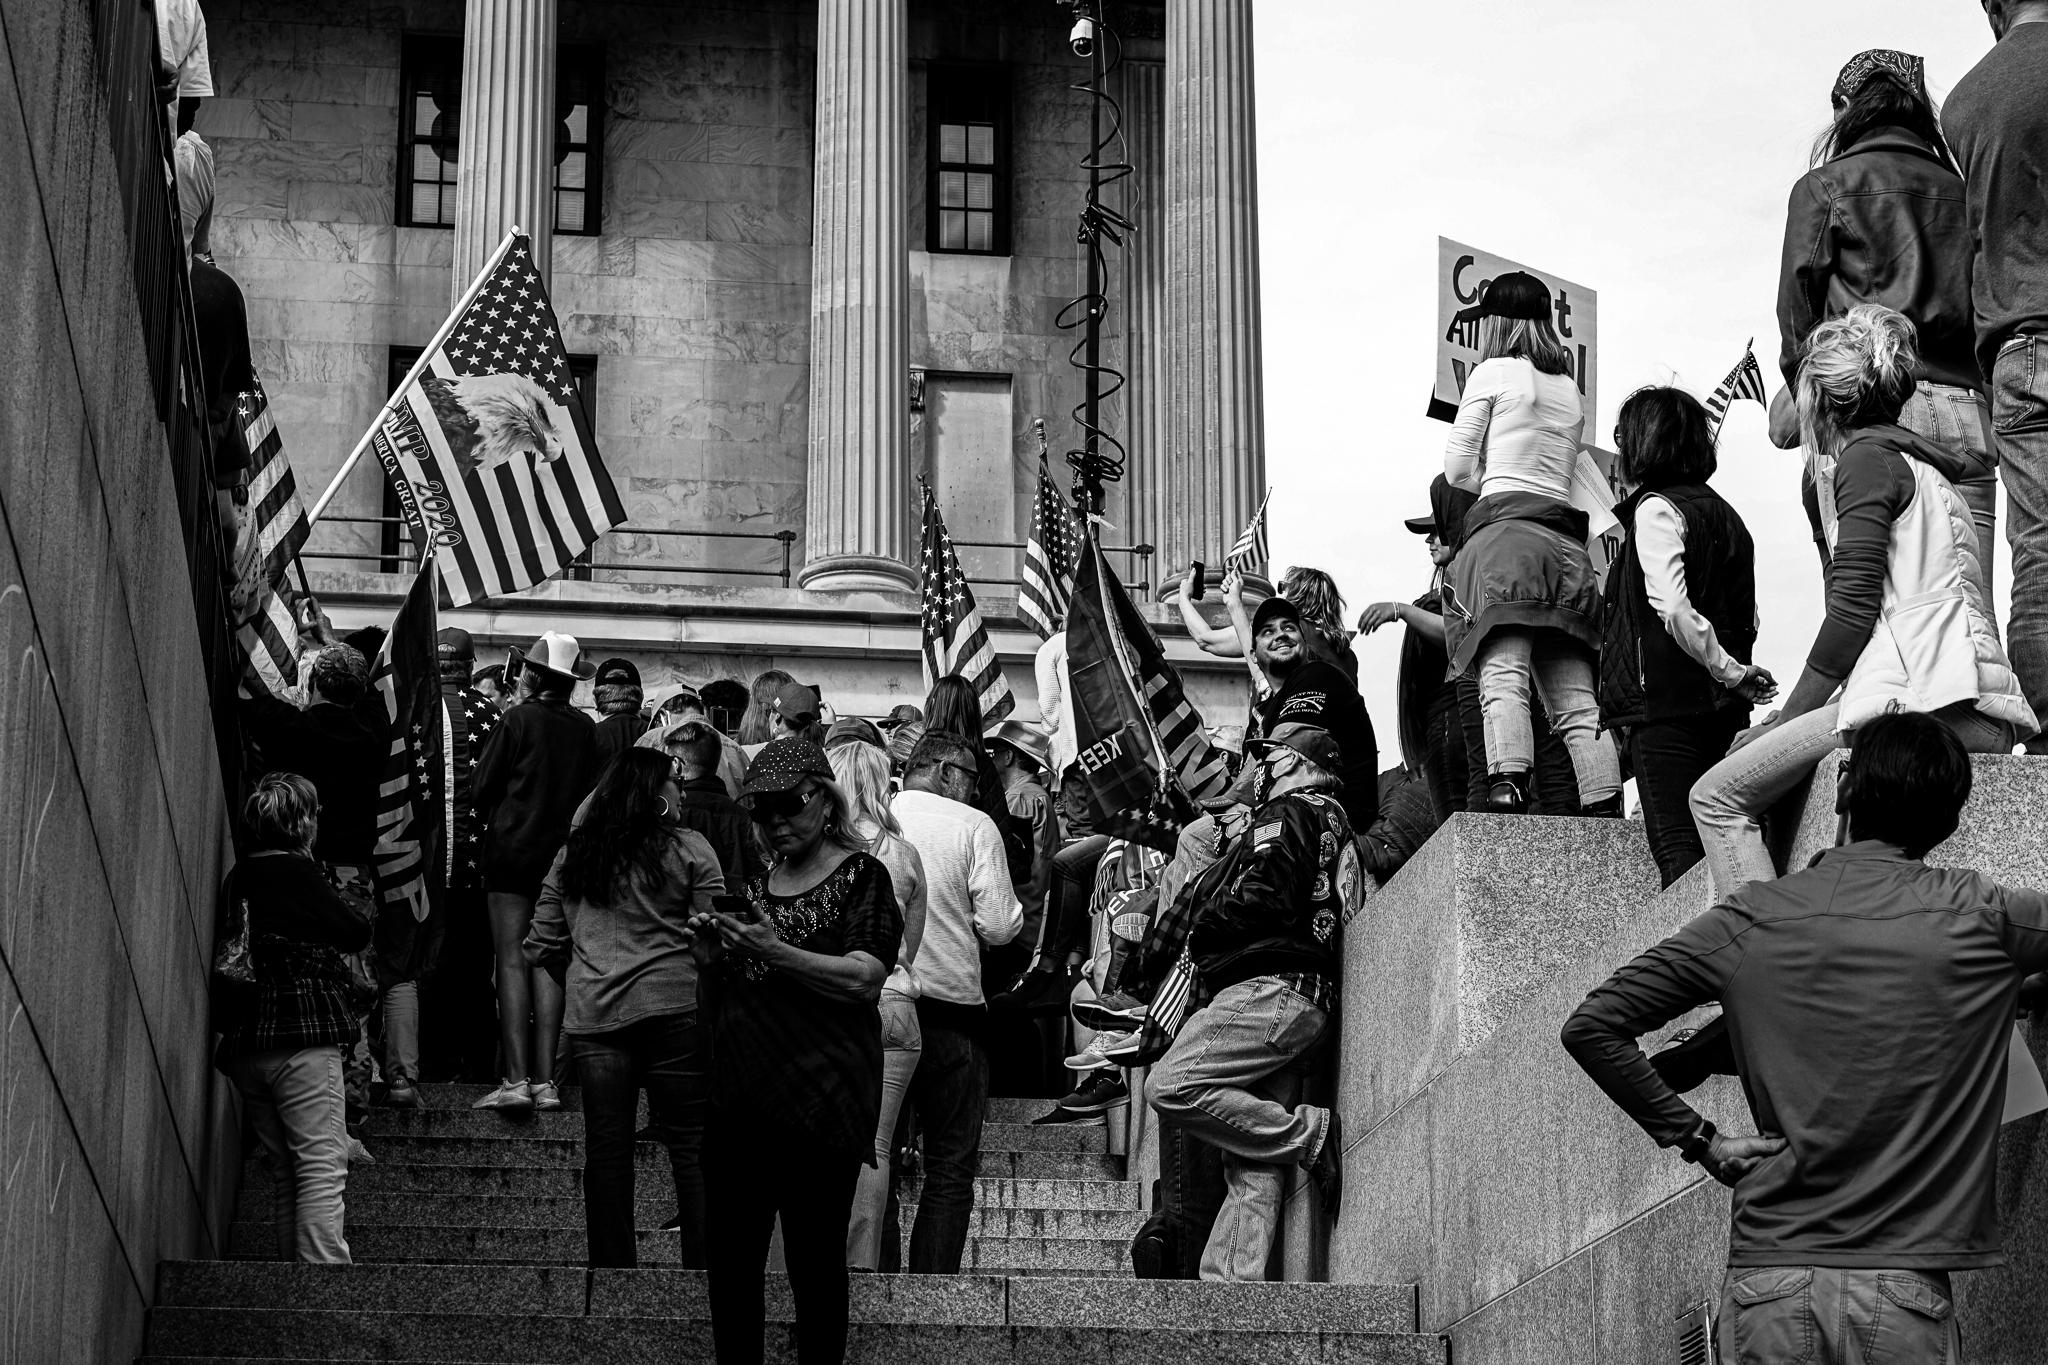 Caught in black and white, a portion of Saturday's crowd in Nashville protesting President-elect Joe Biden's election. (Photo: Matt Bastin)